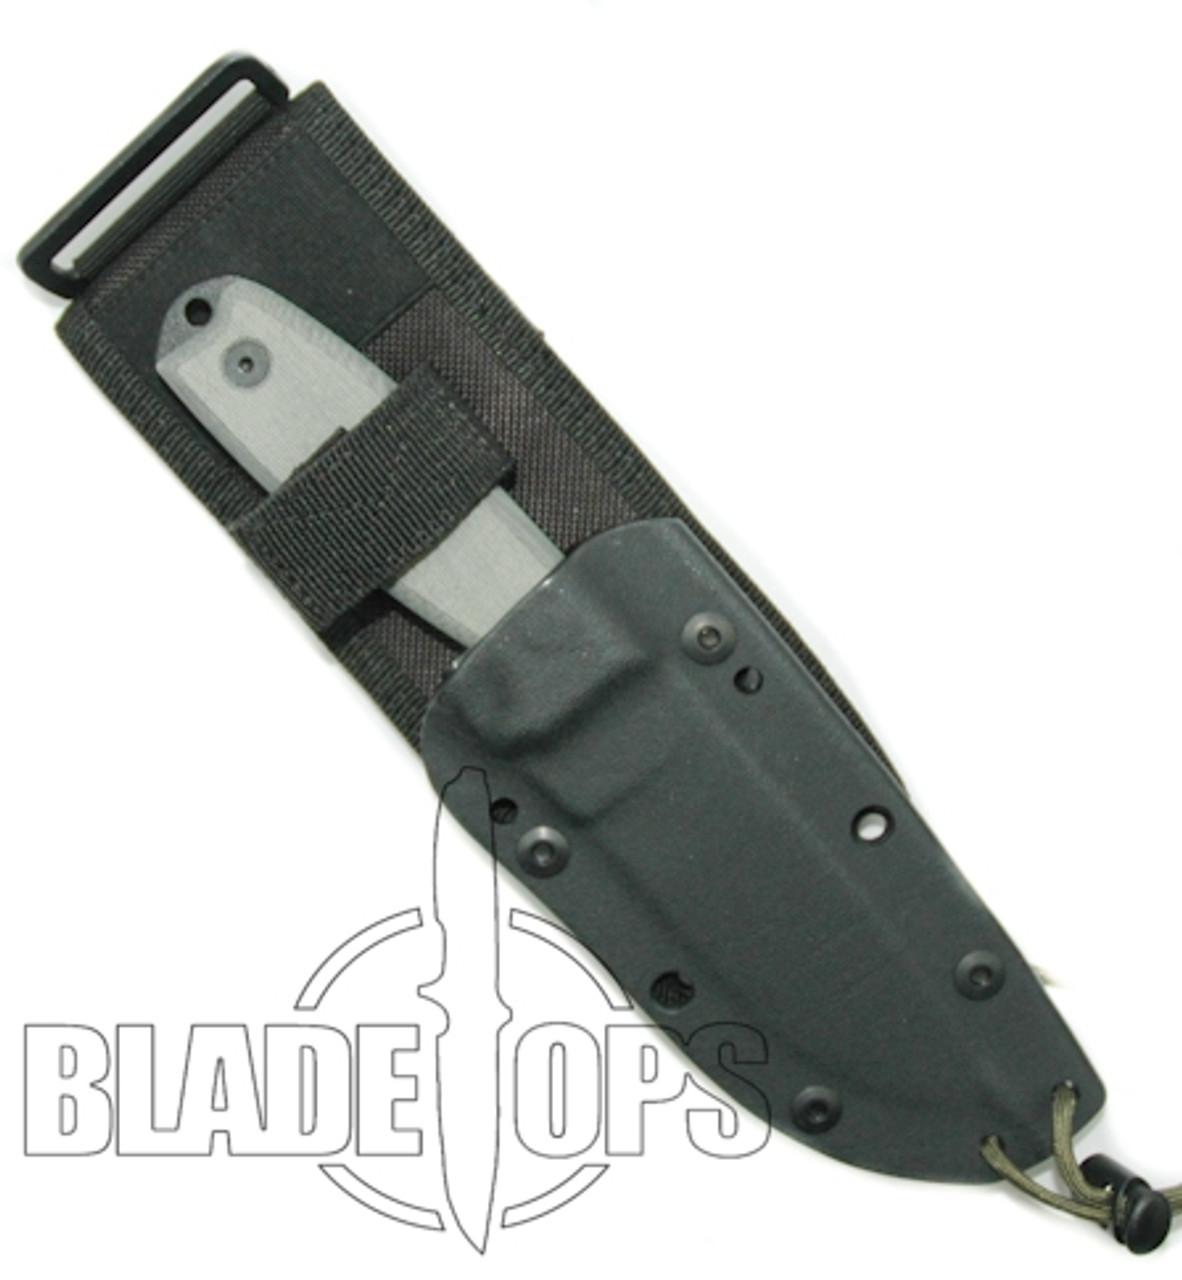 ESEE Knives 4P-MB Fixed Blade Knife, MOLLE Back, Black Blade, Linen Micarta Handle